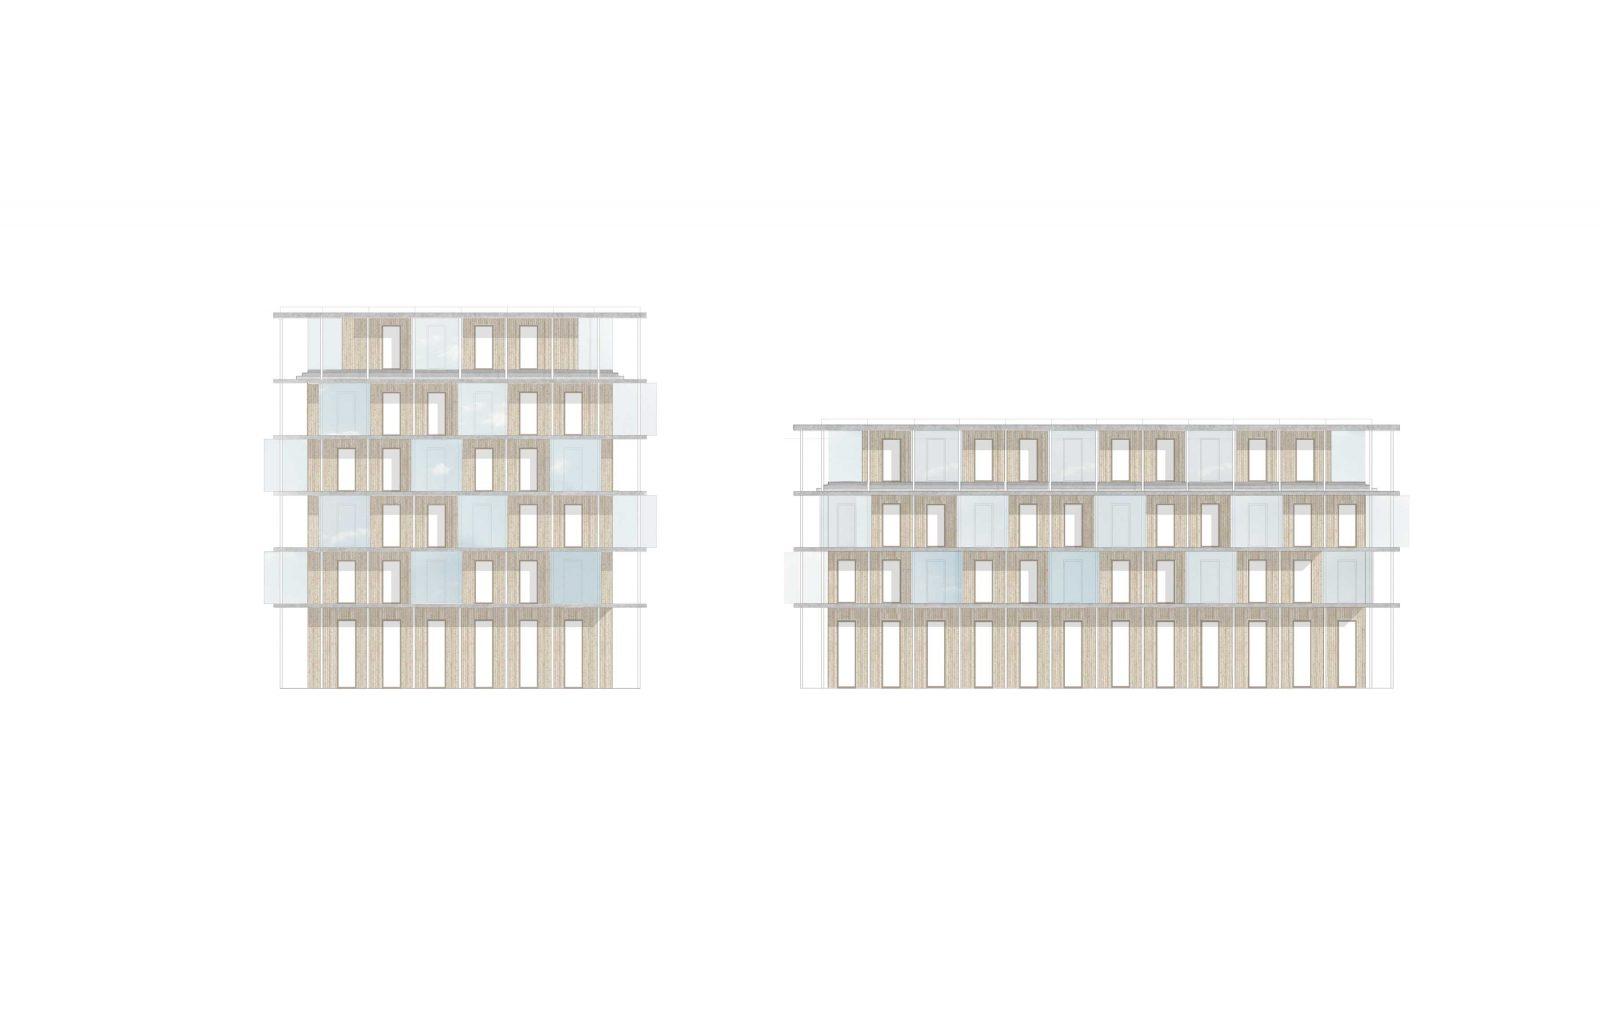 KjellanderSjoberg Brofastet facades